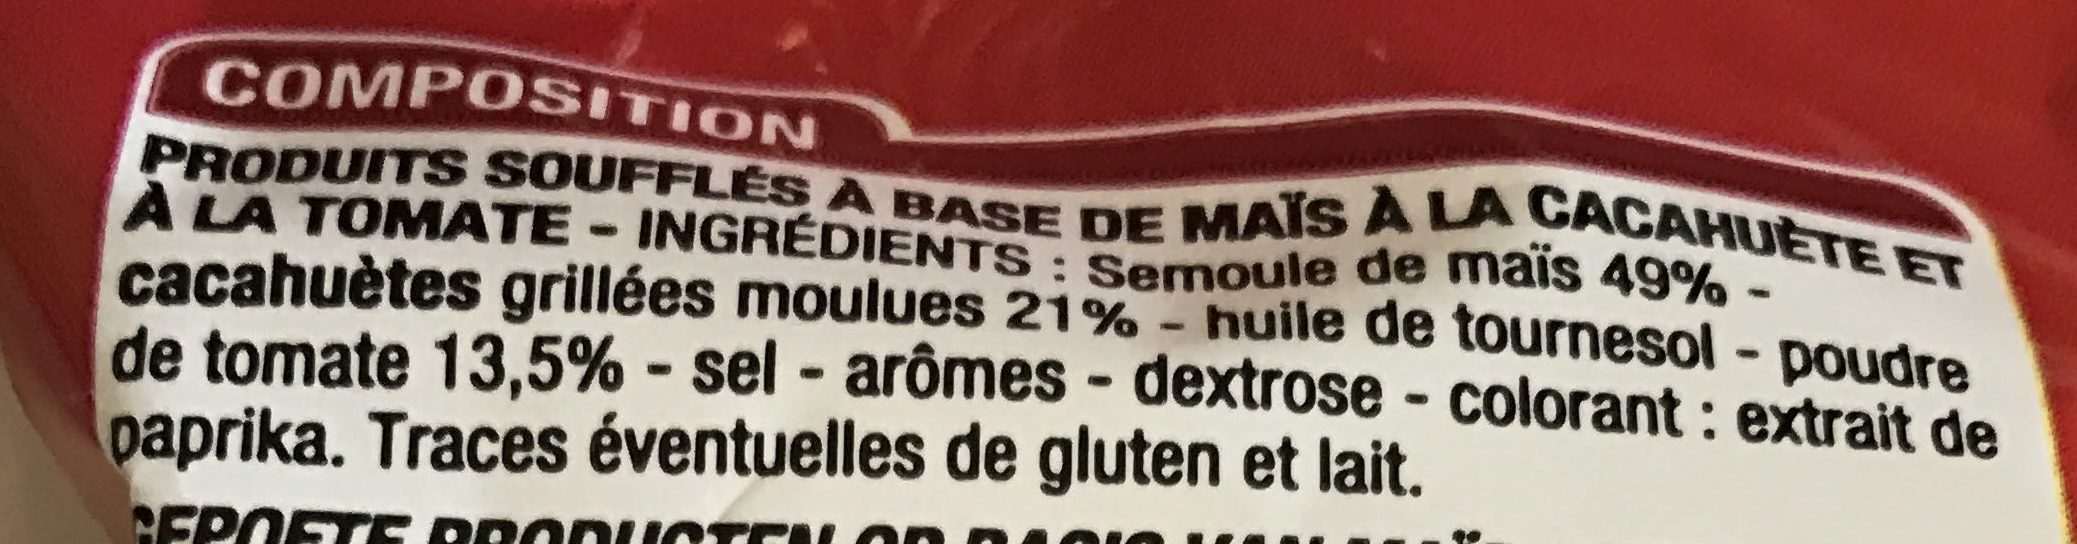 Soufflés Tomate - Ingredients